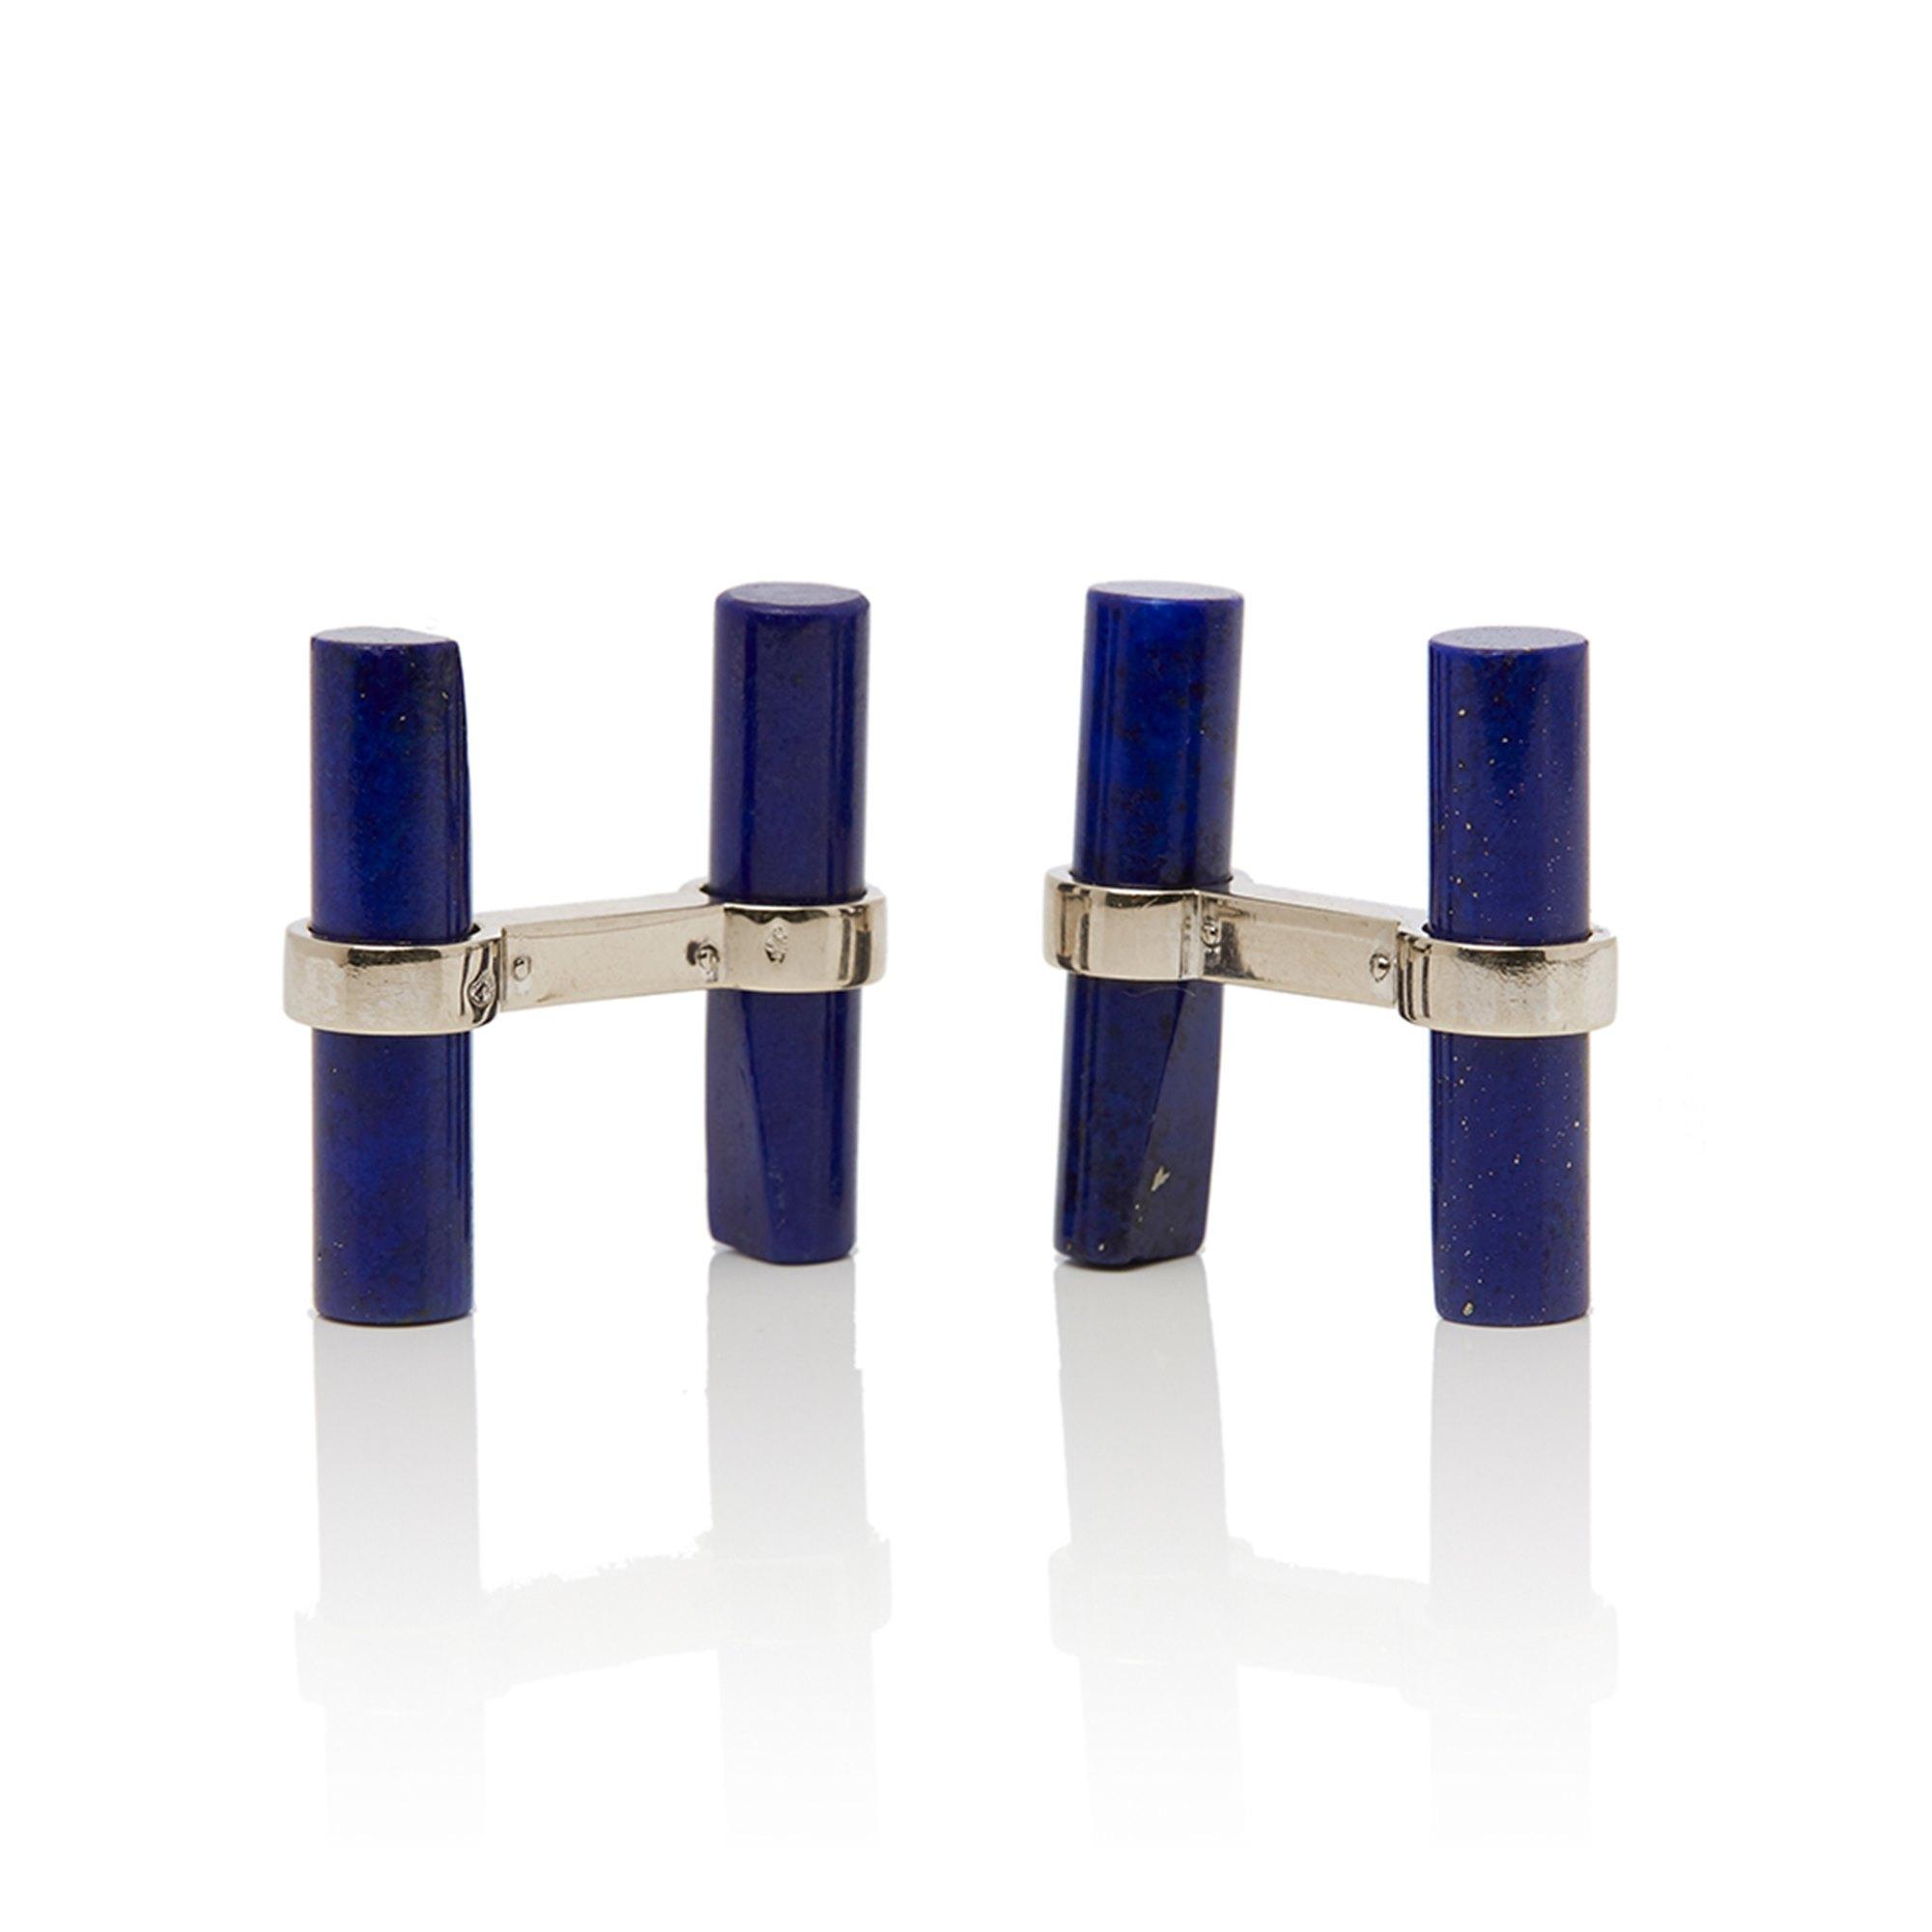 Cartier 18k White Gold Lapis Lazuli Baton Vintage Cufflinks